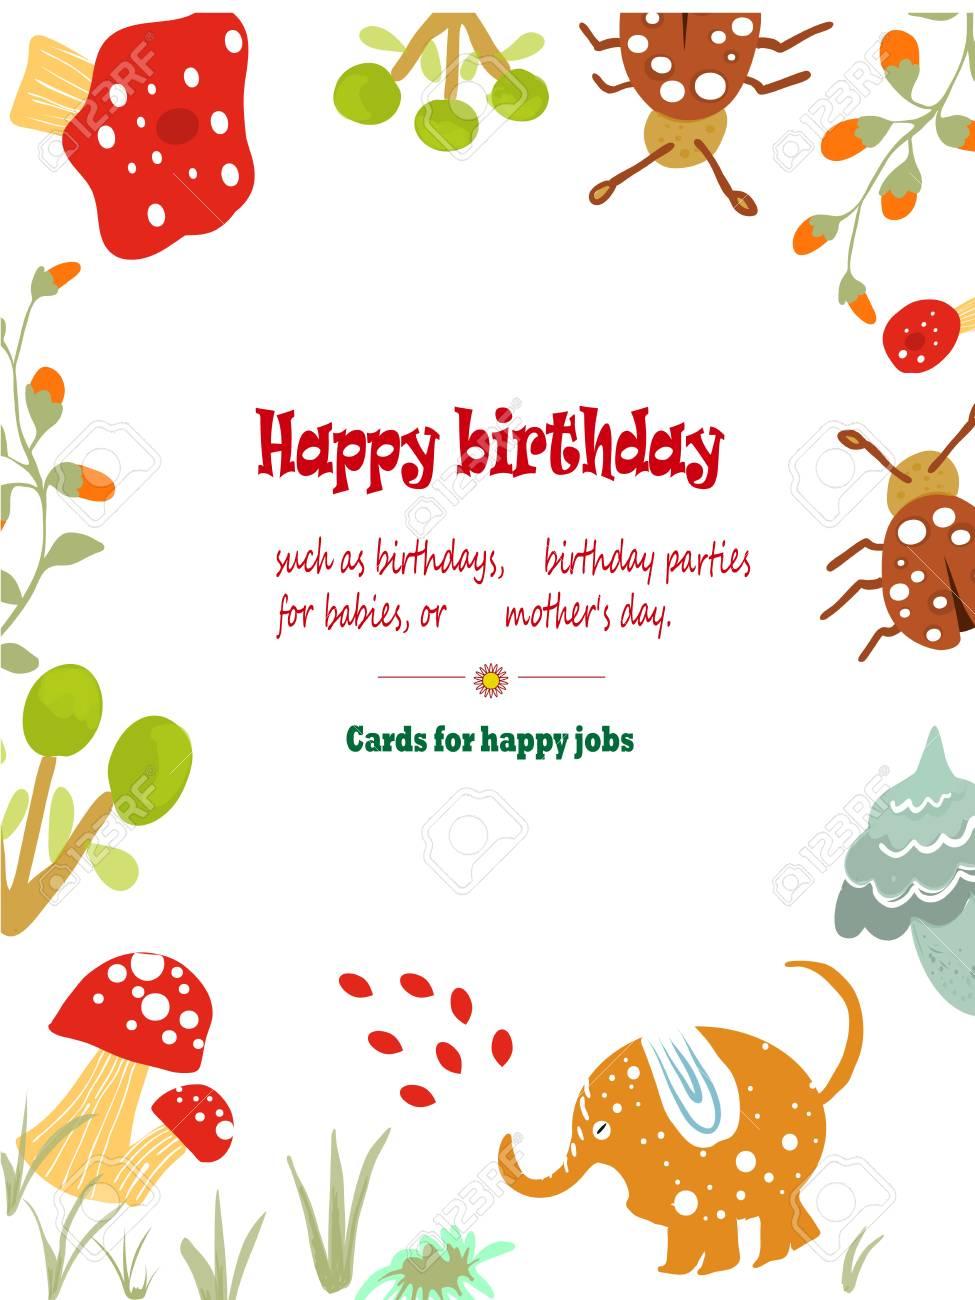 Cute Invitation Card For Parties Invitations Happy Birthday